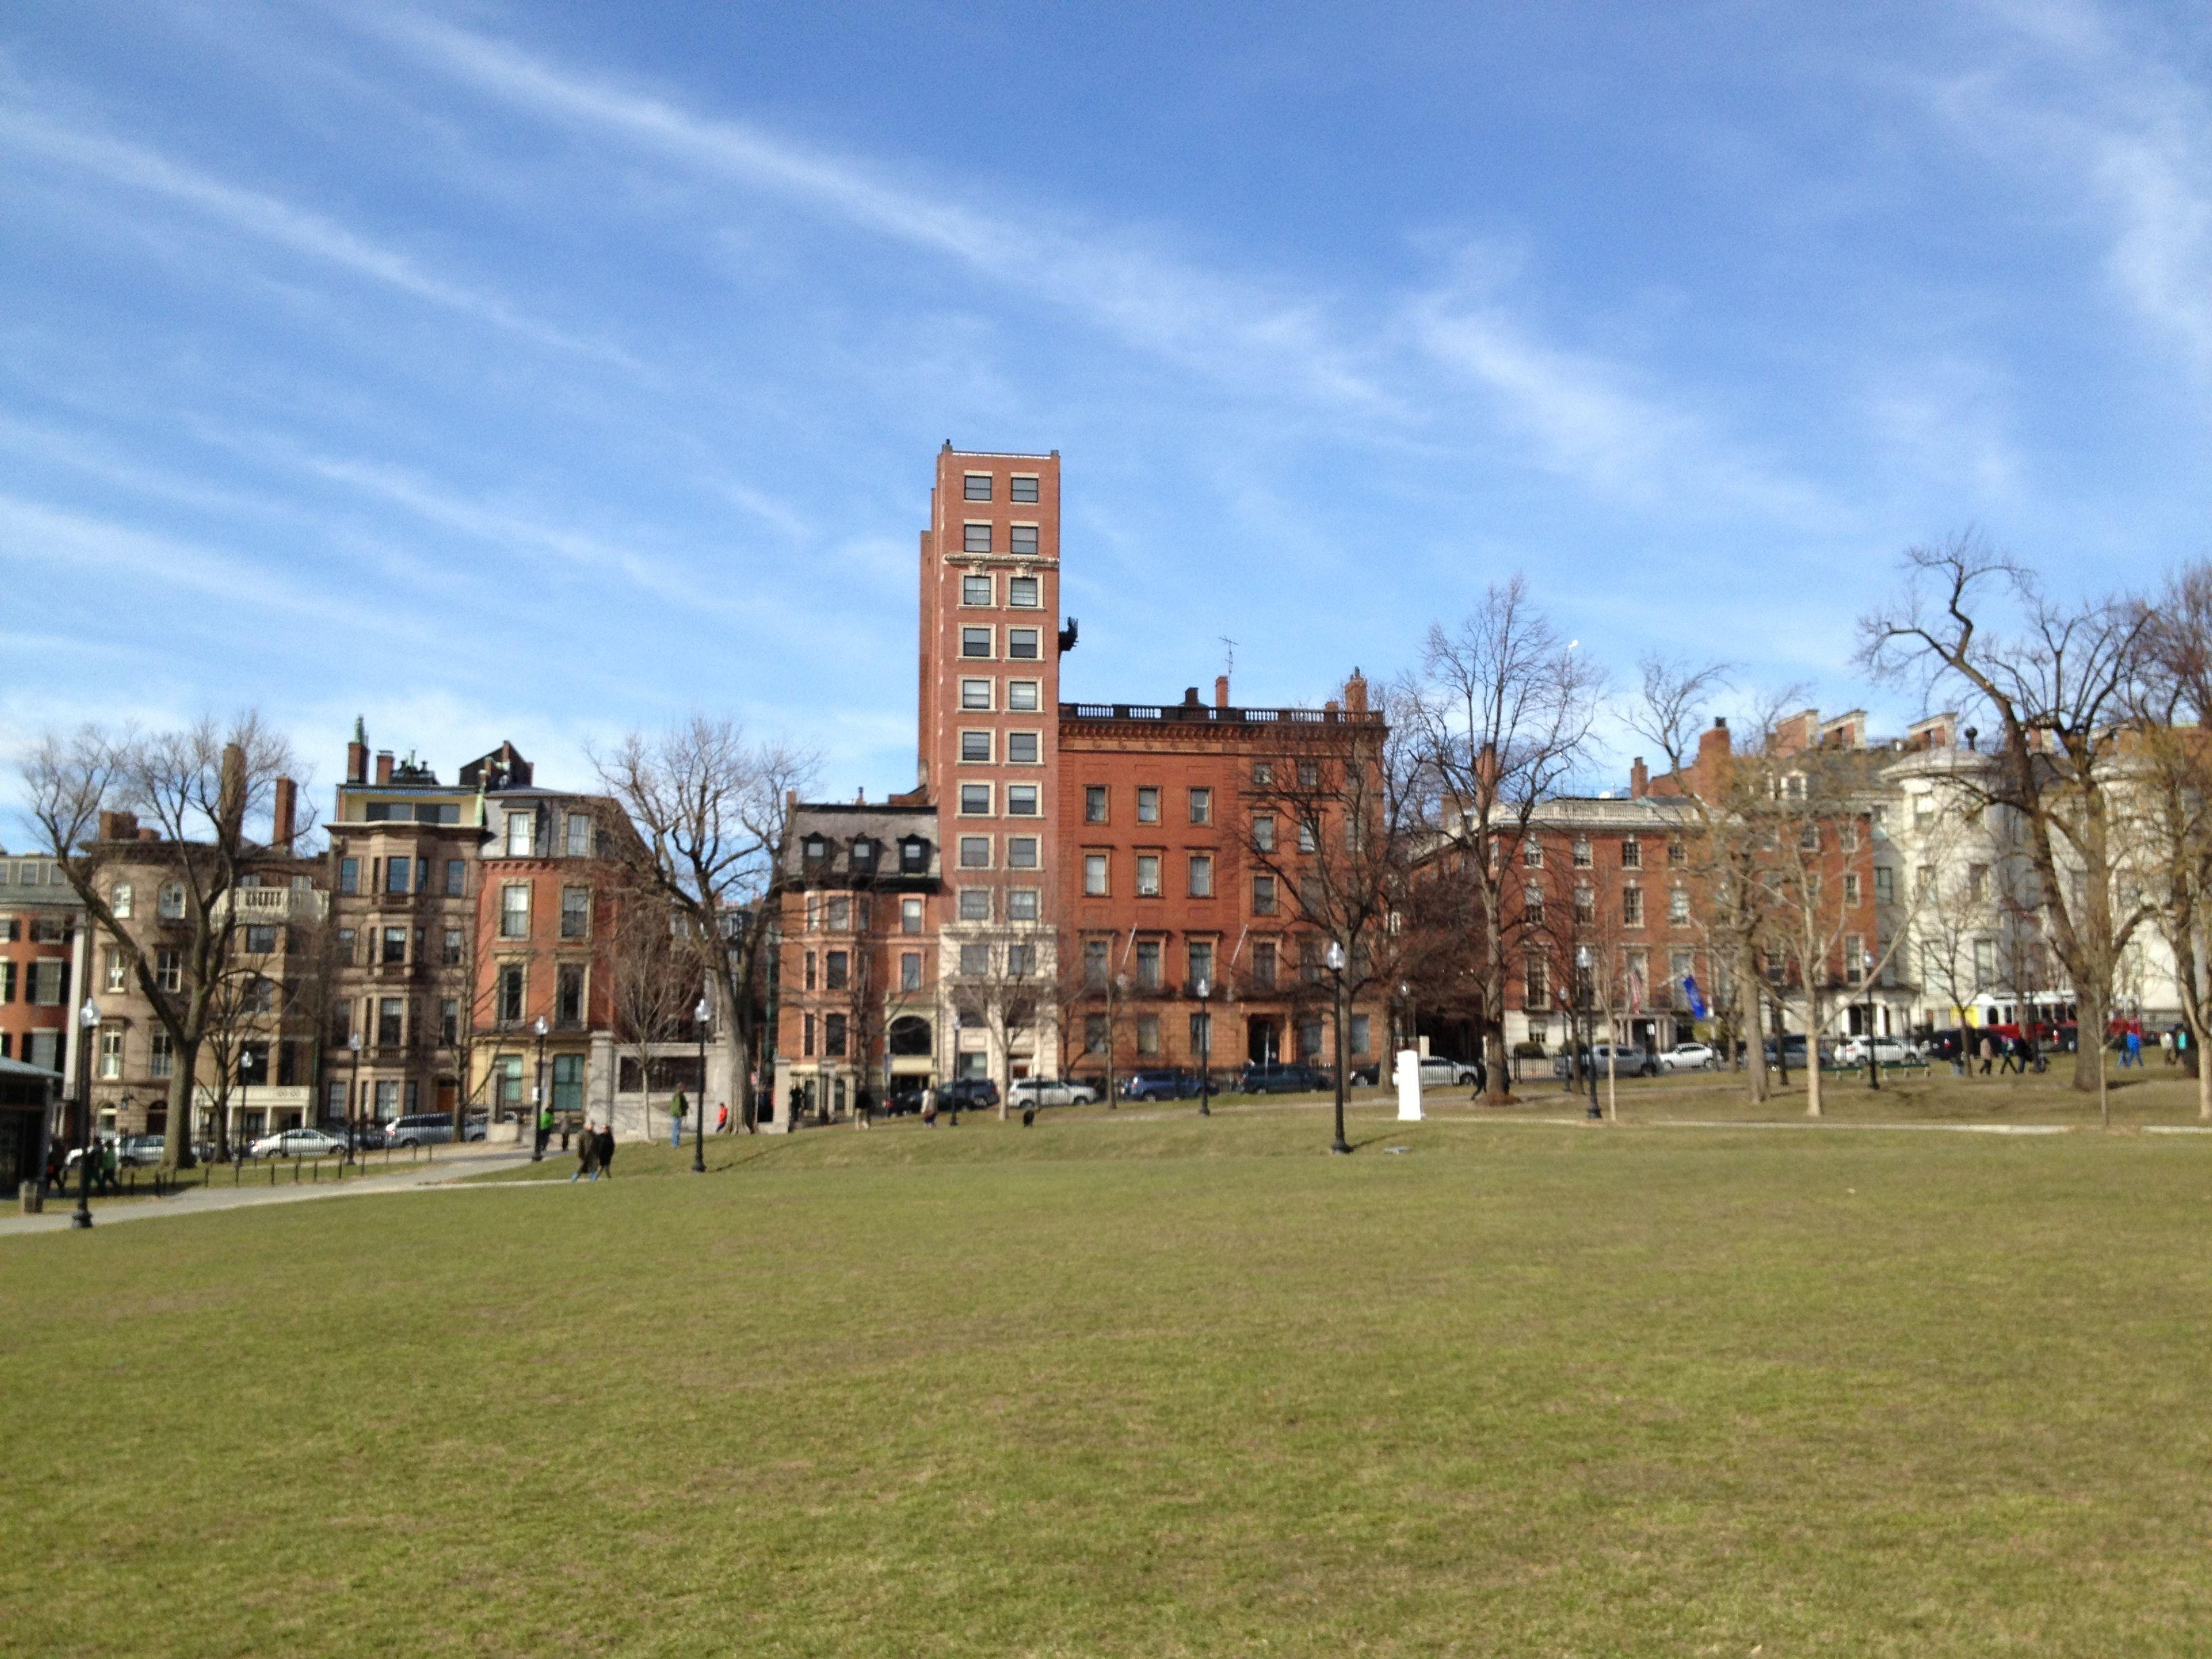 Beacon Street buildings in March 2013. © Michael Rass